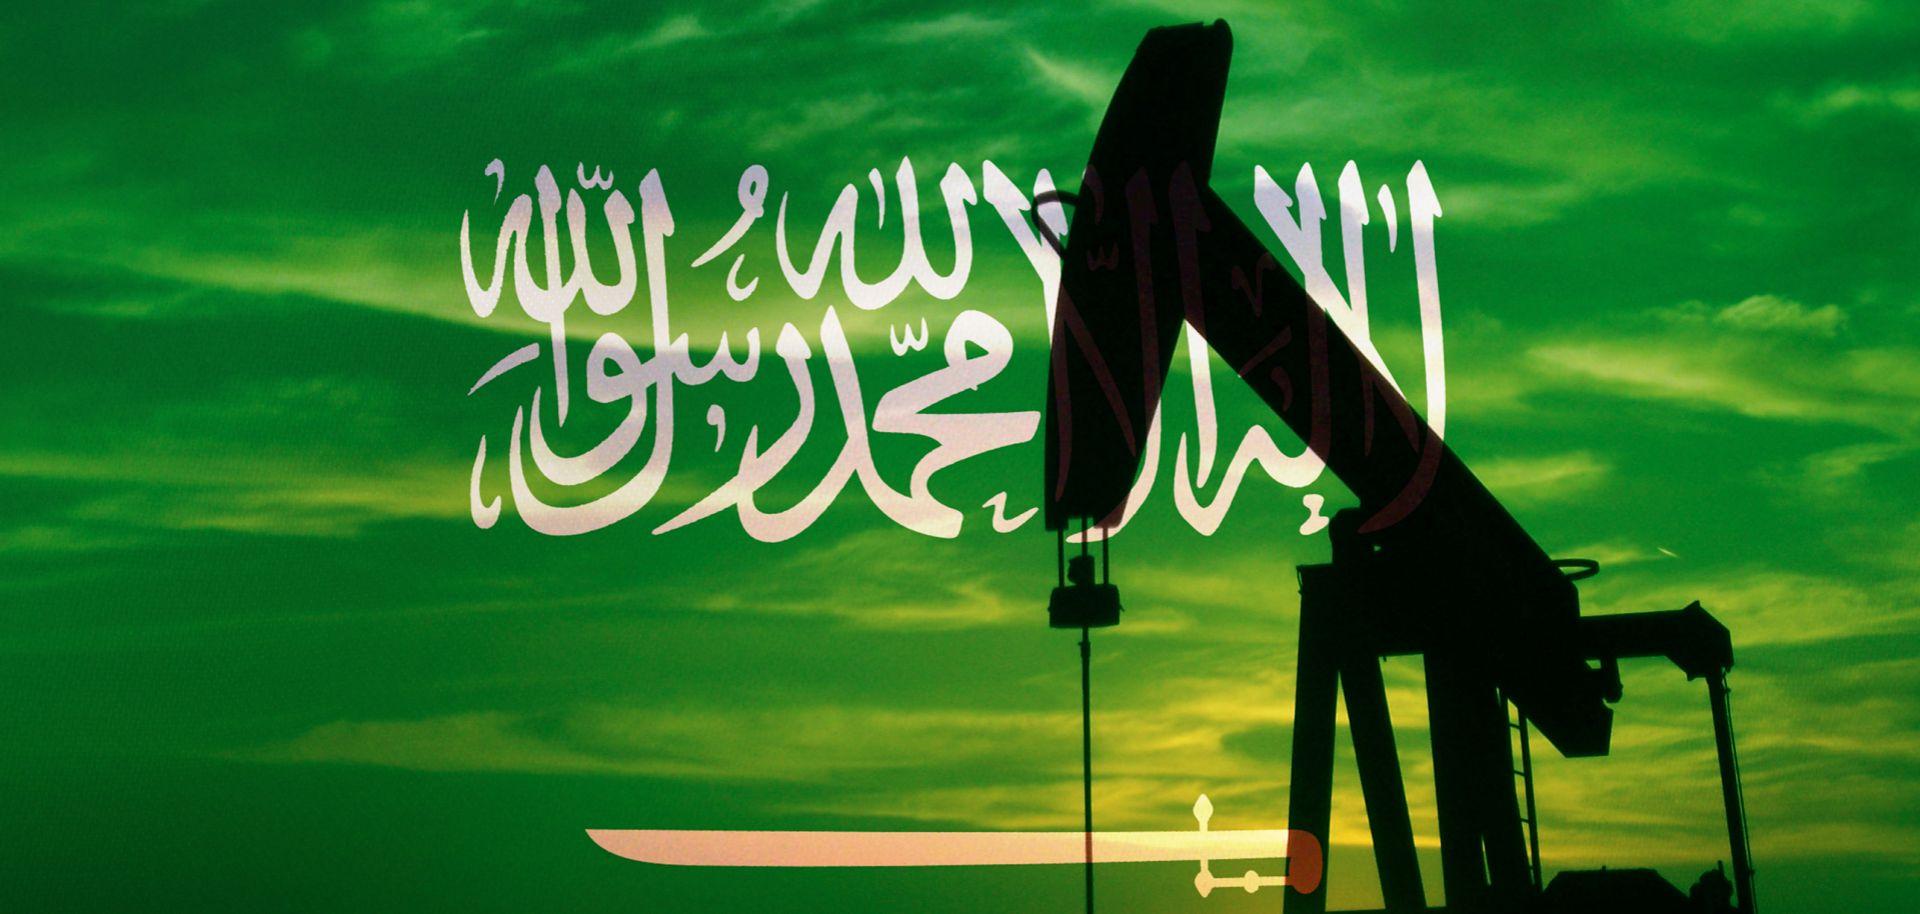 An image of a Saudi flag overlaying an oil pumpjack.